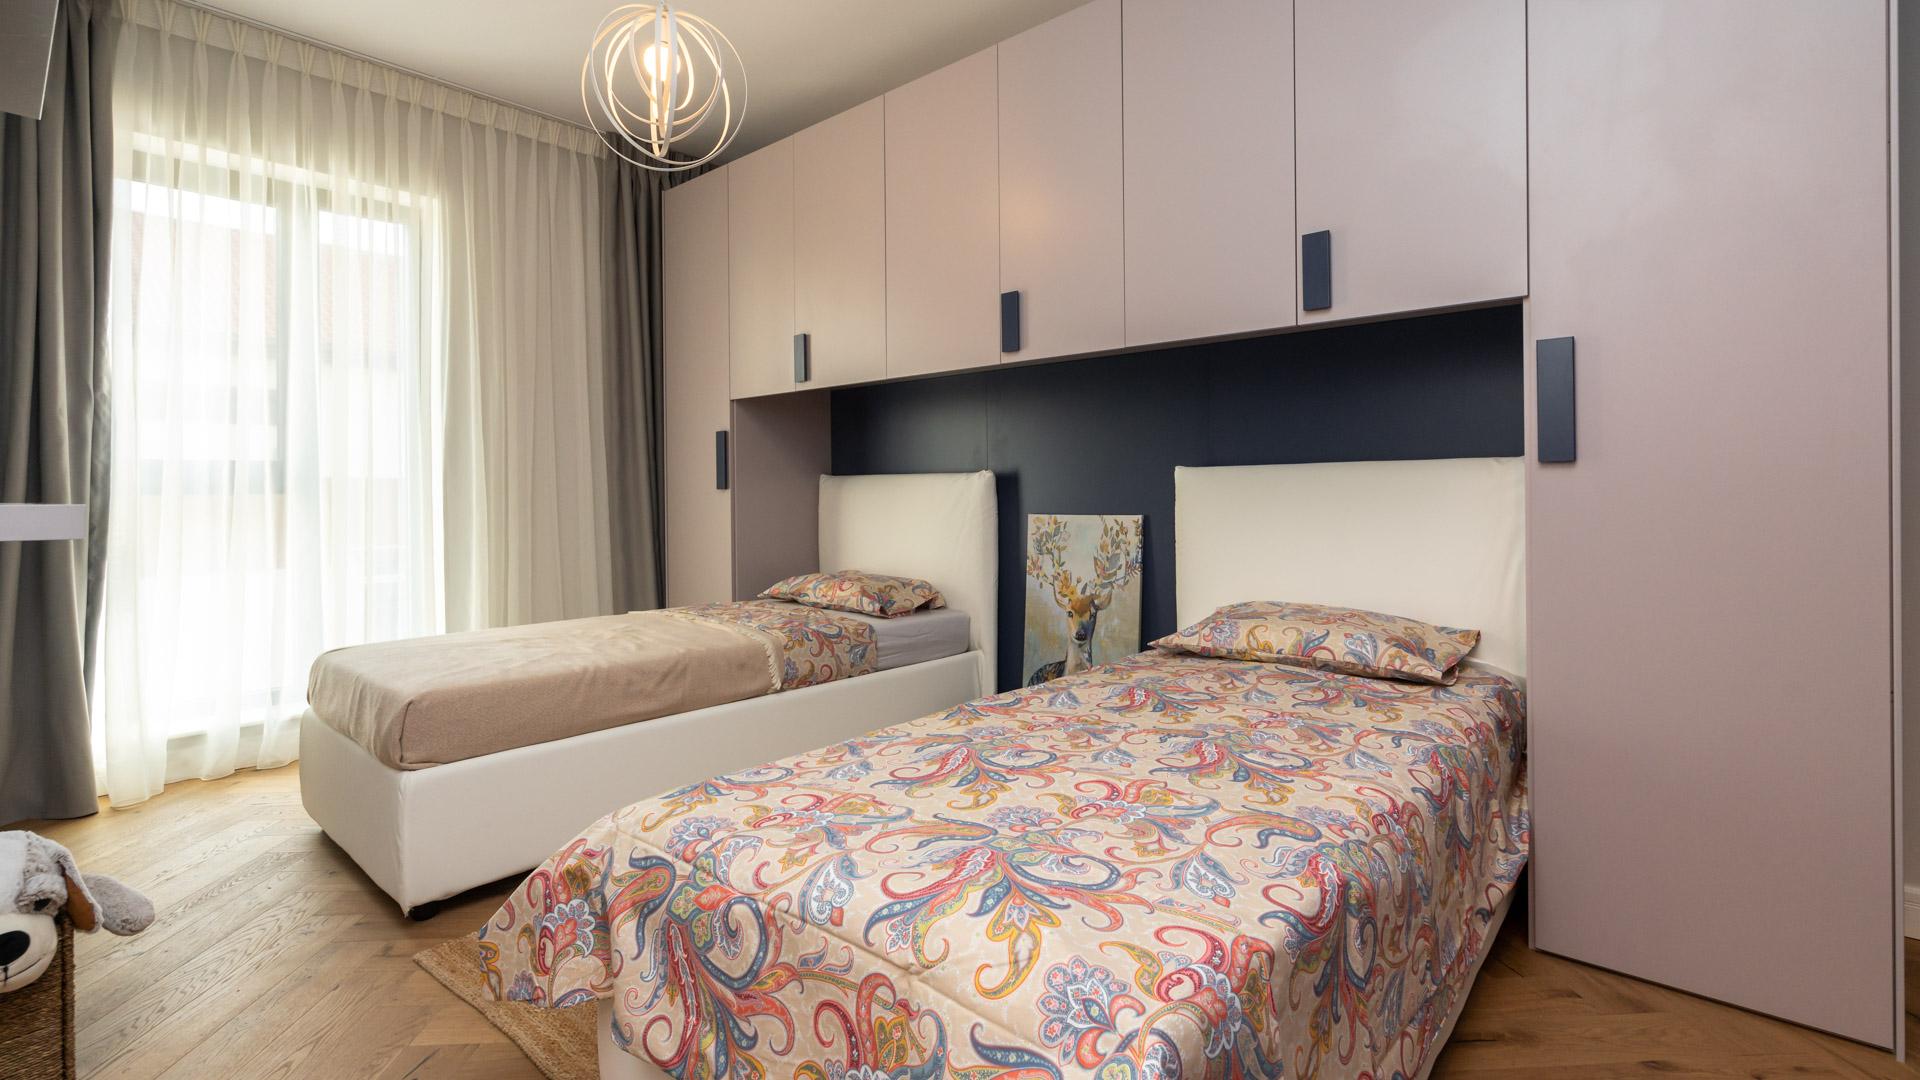 Northville-Baneasa-vila-showroom-dormitor